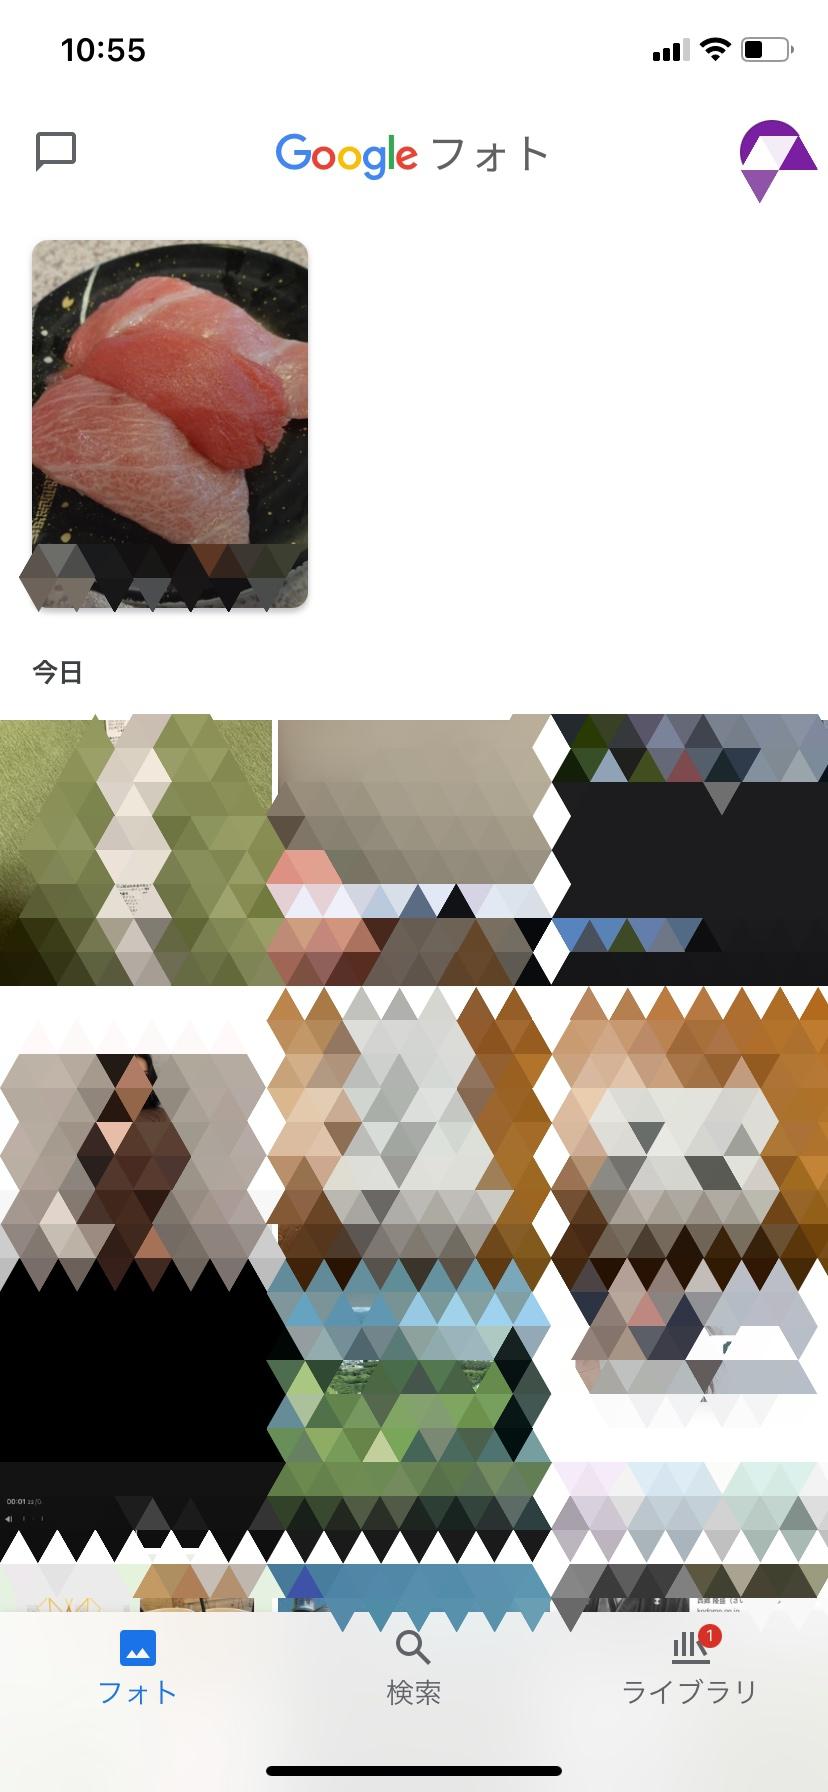 Google(グーグル) Google フォトを使ったヨコさんのクチコミ画像1